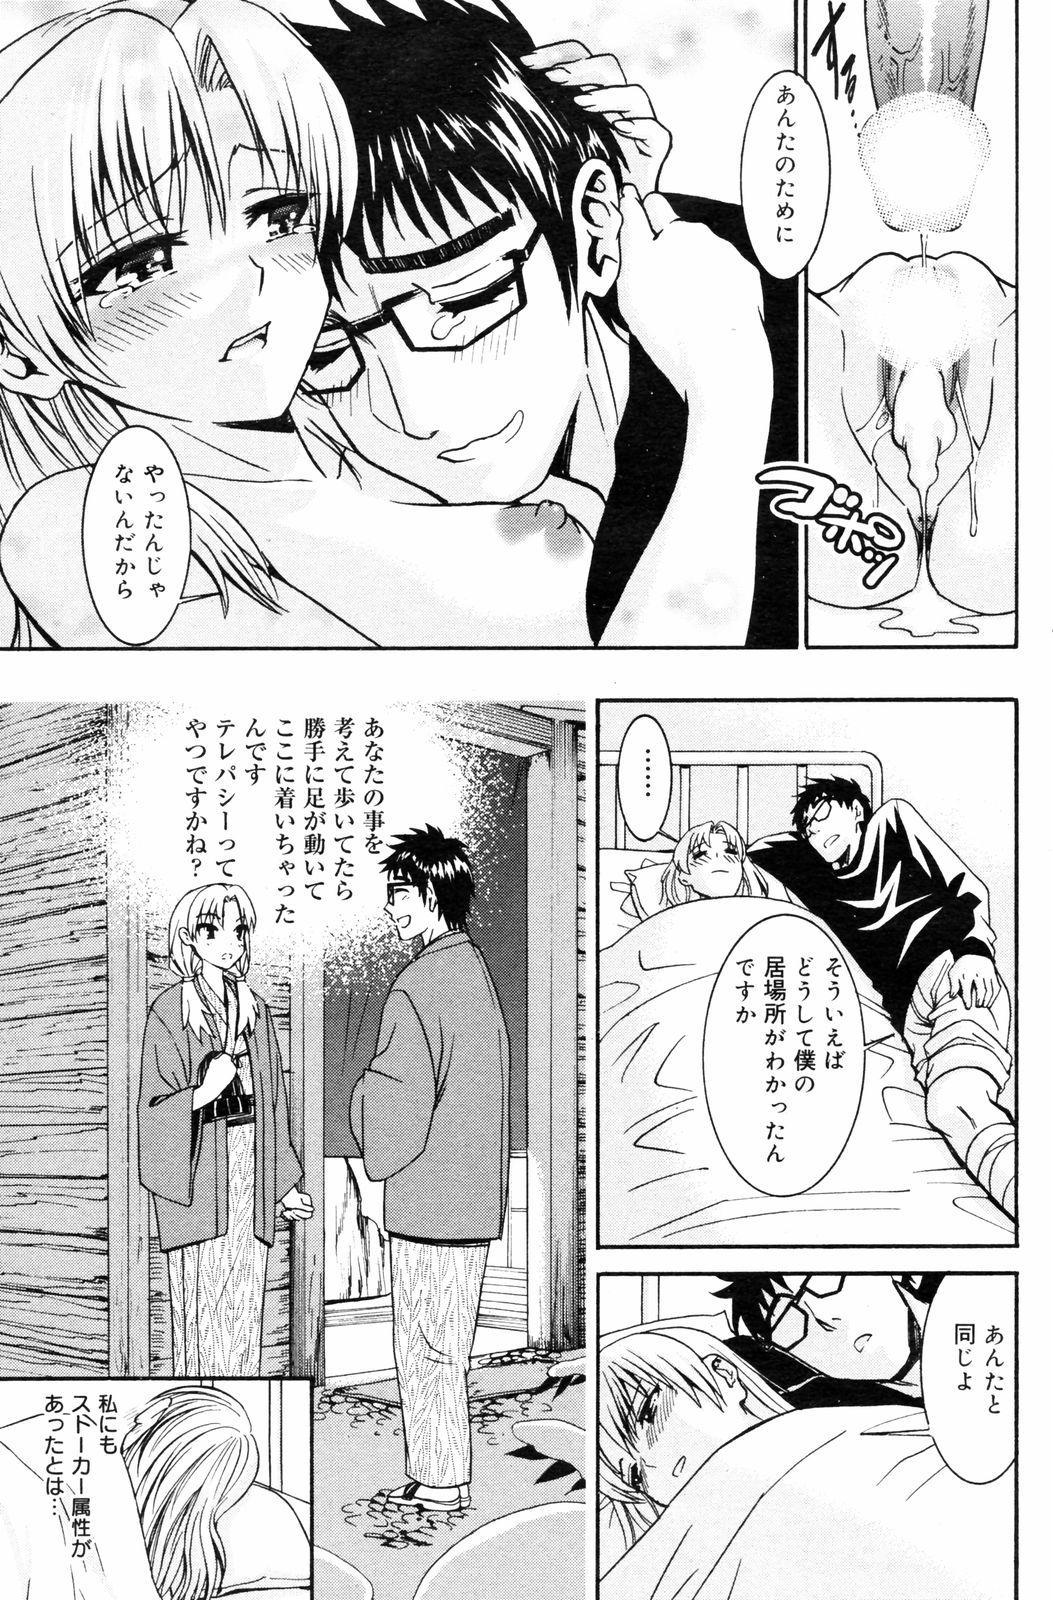 Manga Bangaichi 2008-03 152